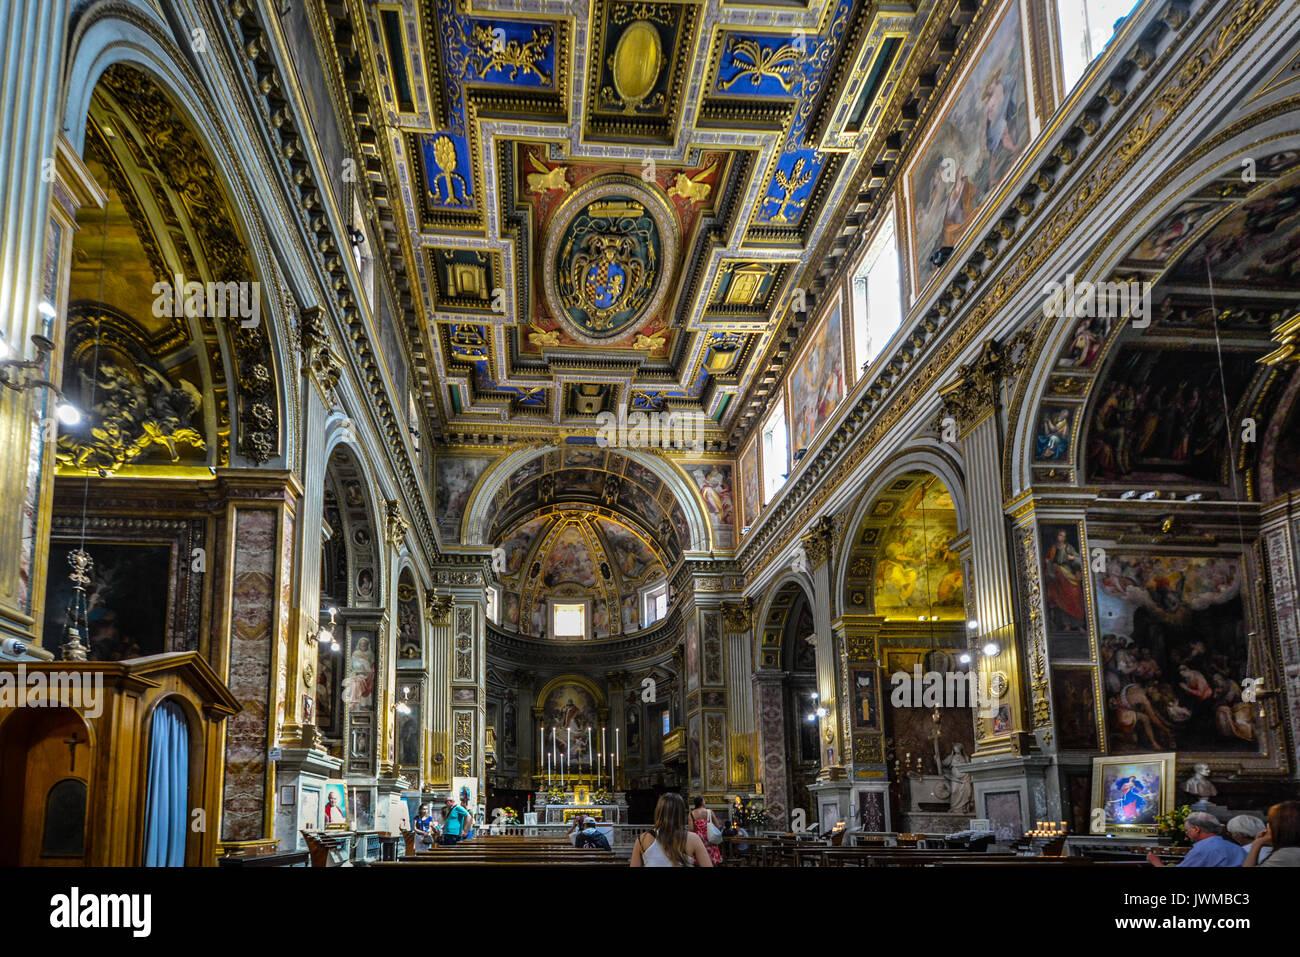 Innenraum von St. Marcello Al Corso Kirche in Rom Italien Stockbild